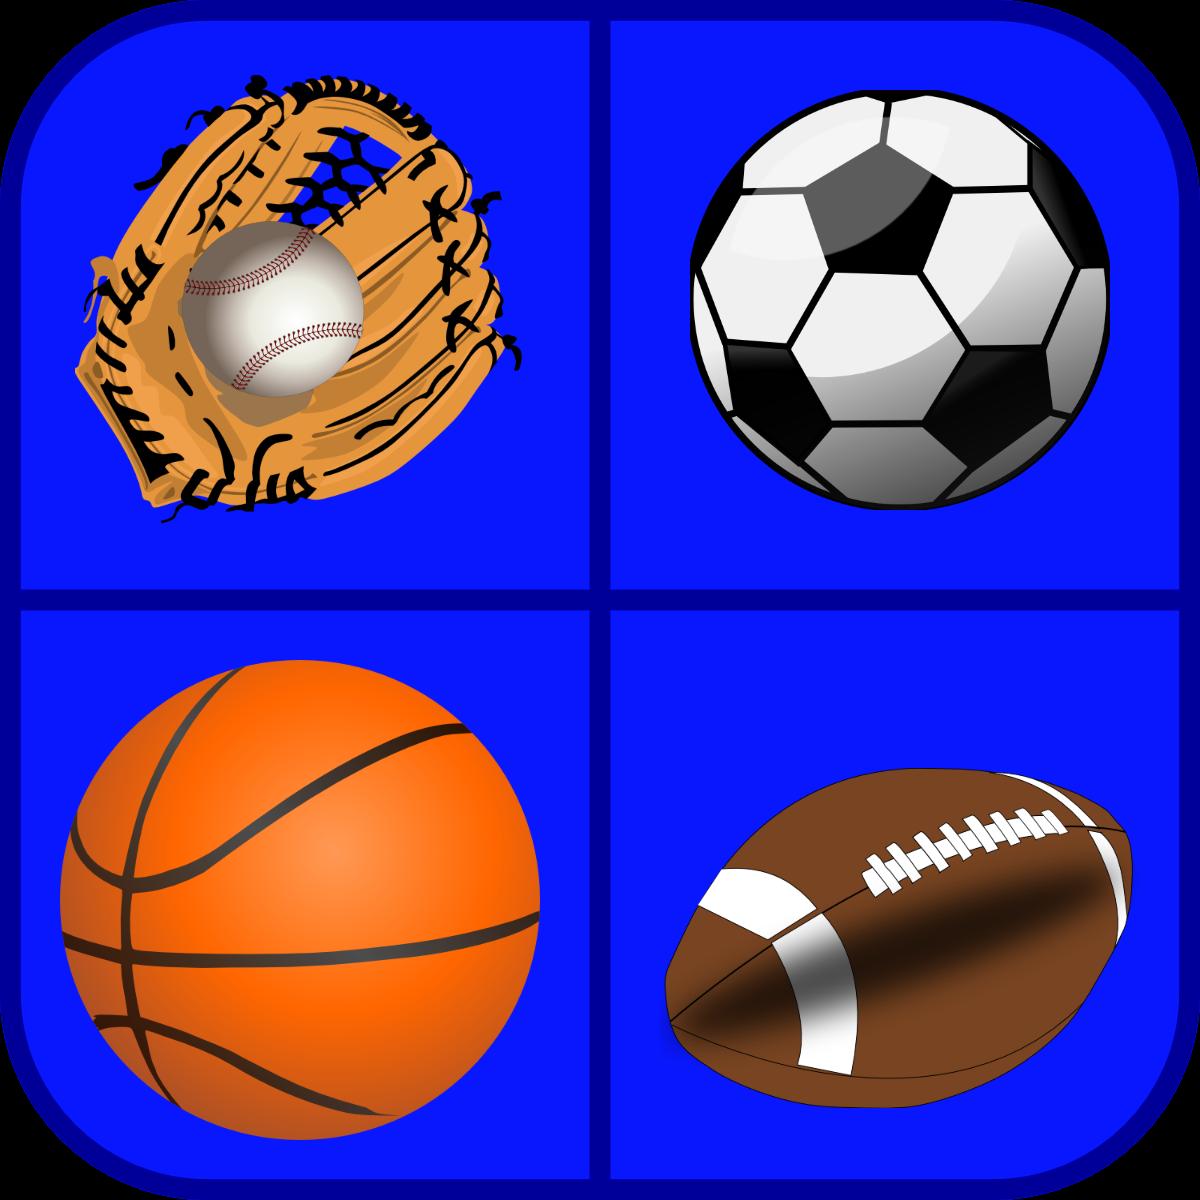 baseball, soccer ball, basketball, football